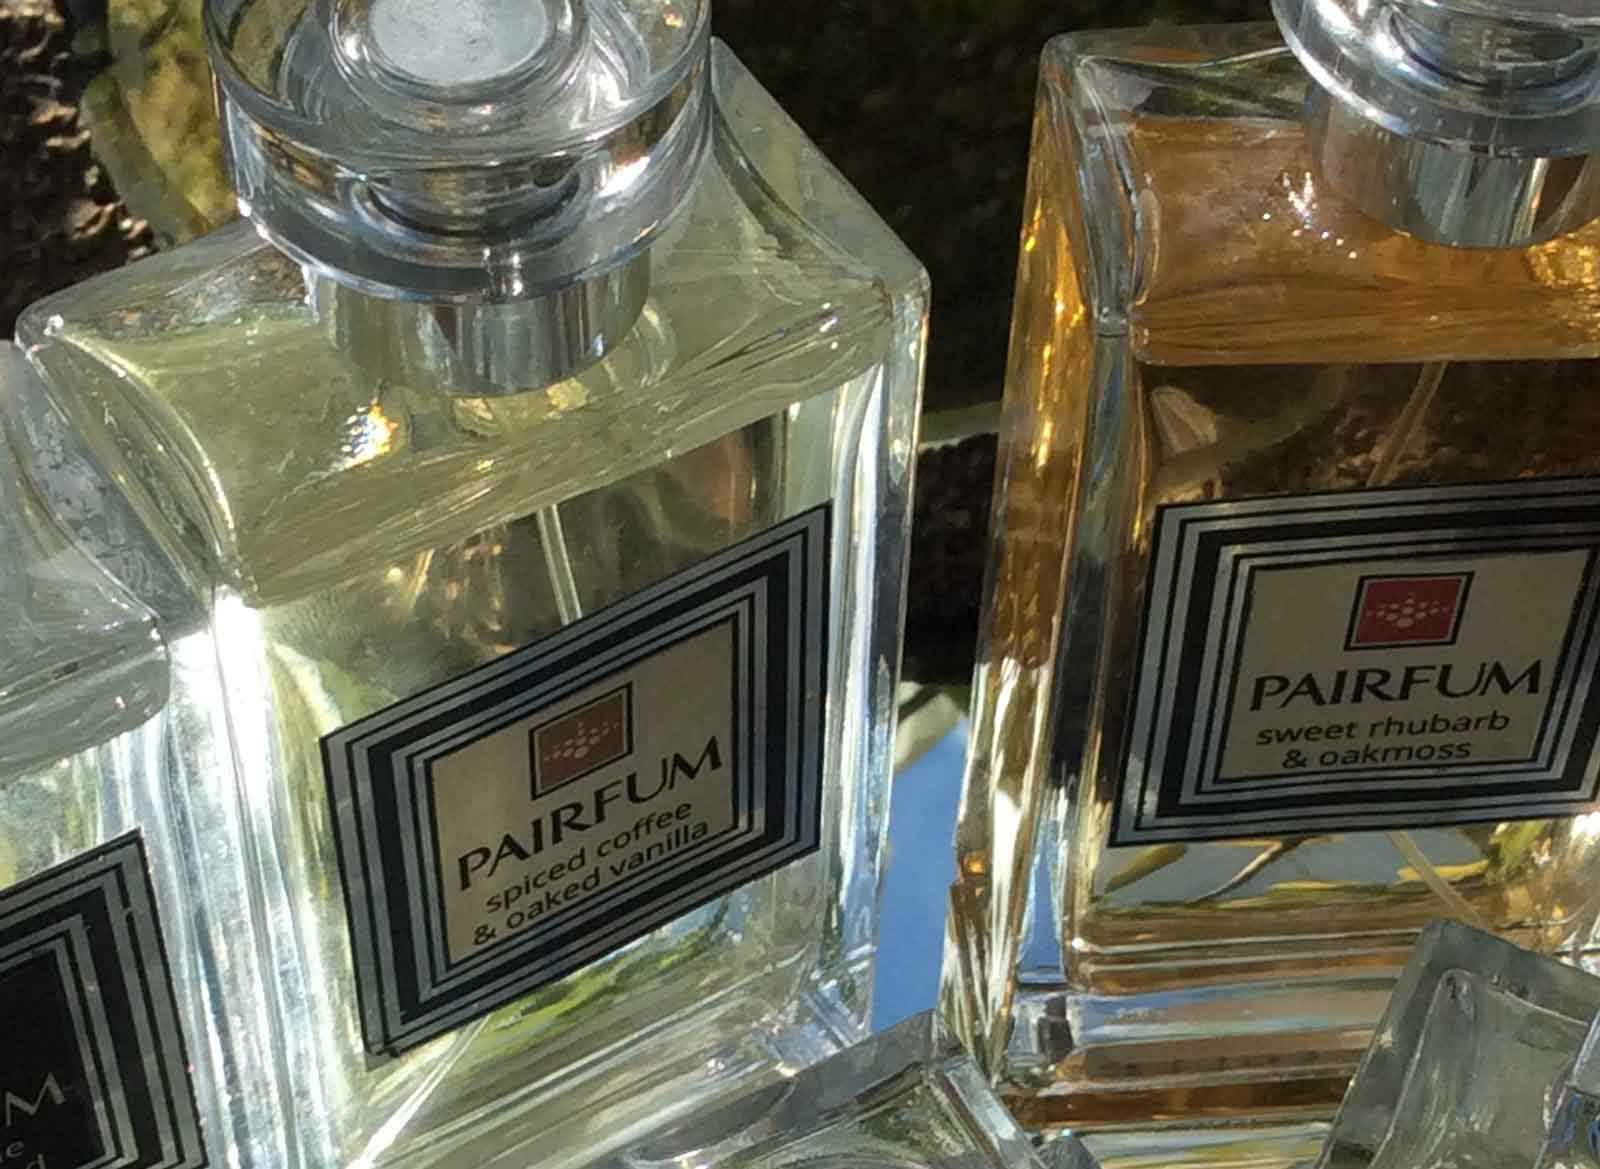 PAIRFUM boutique couture perfume Niche eau de parfum private collection home fragrance skin care sweet rhubarb oakmoss